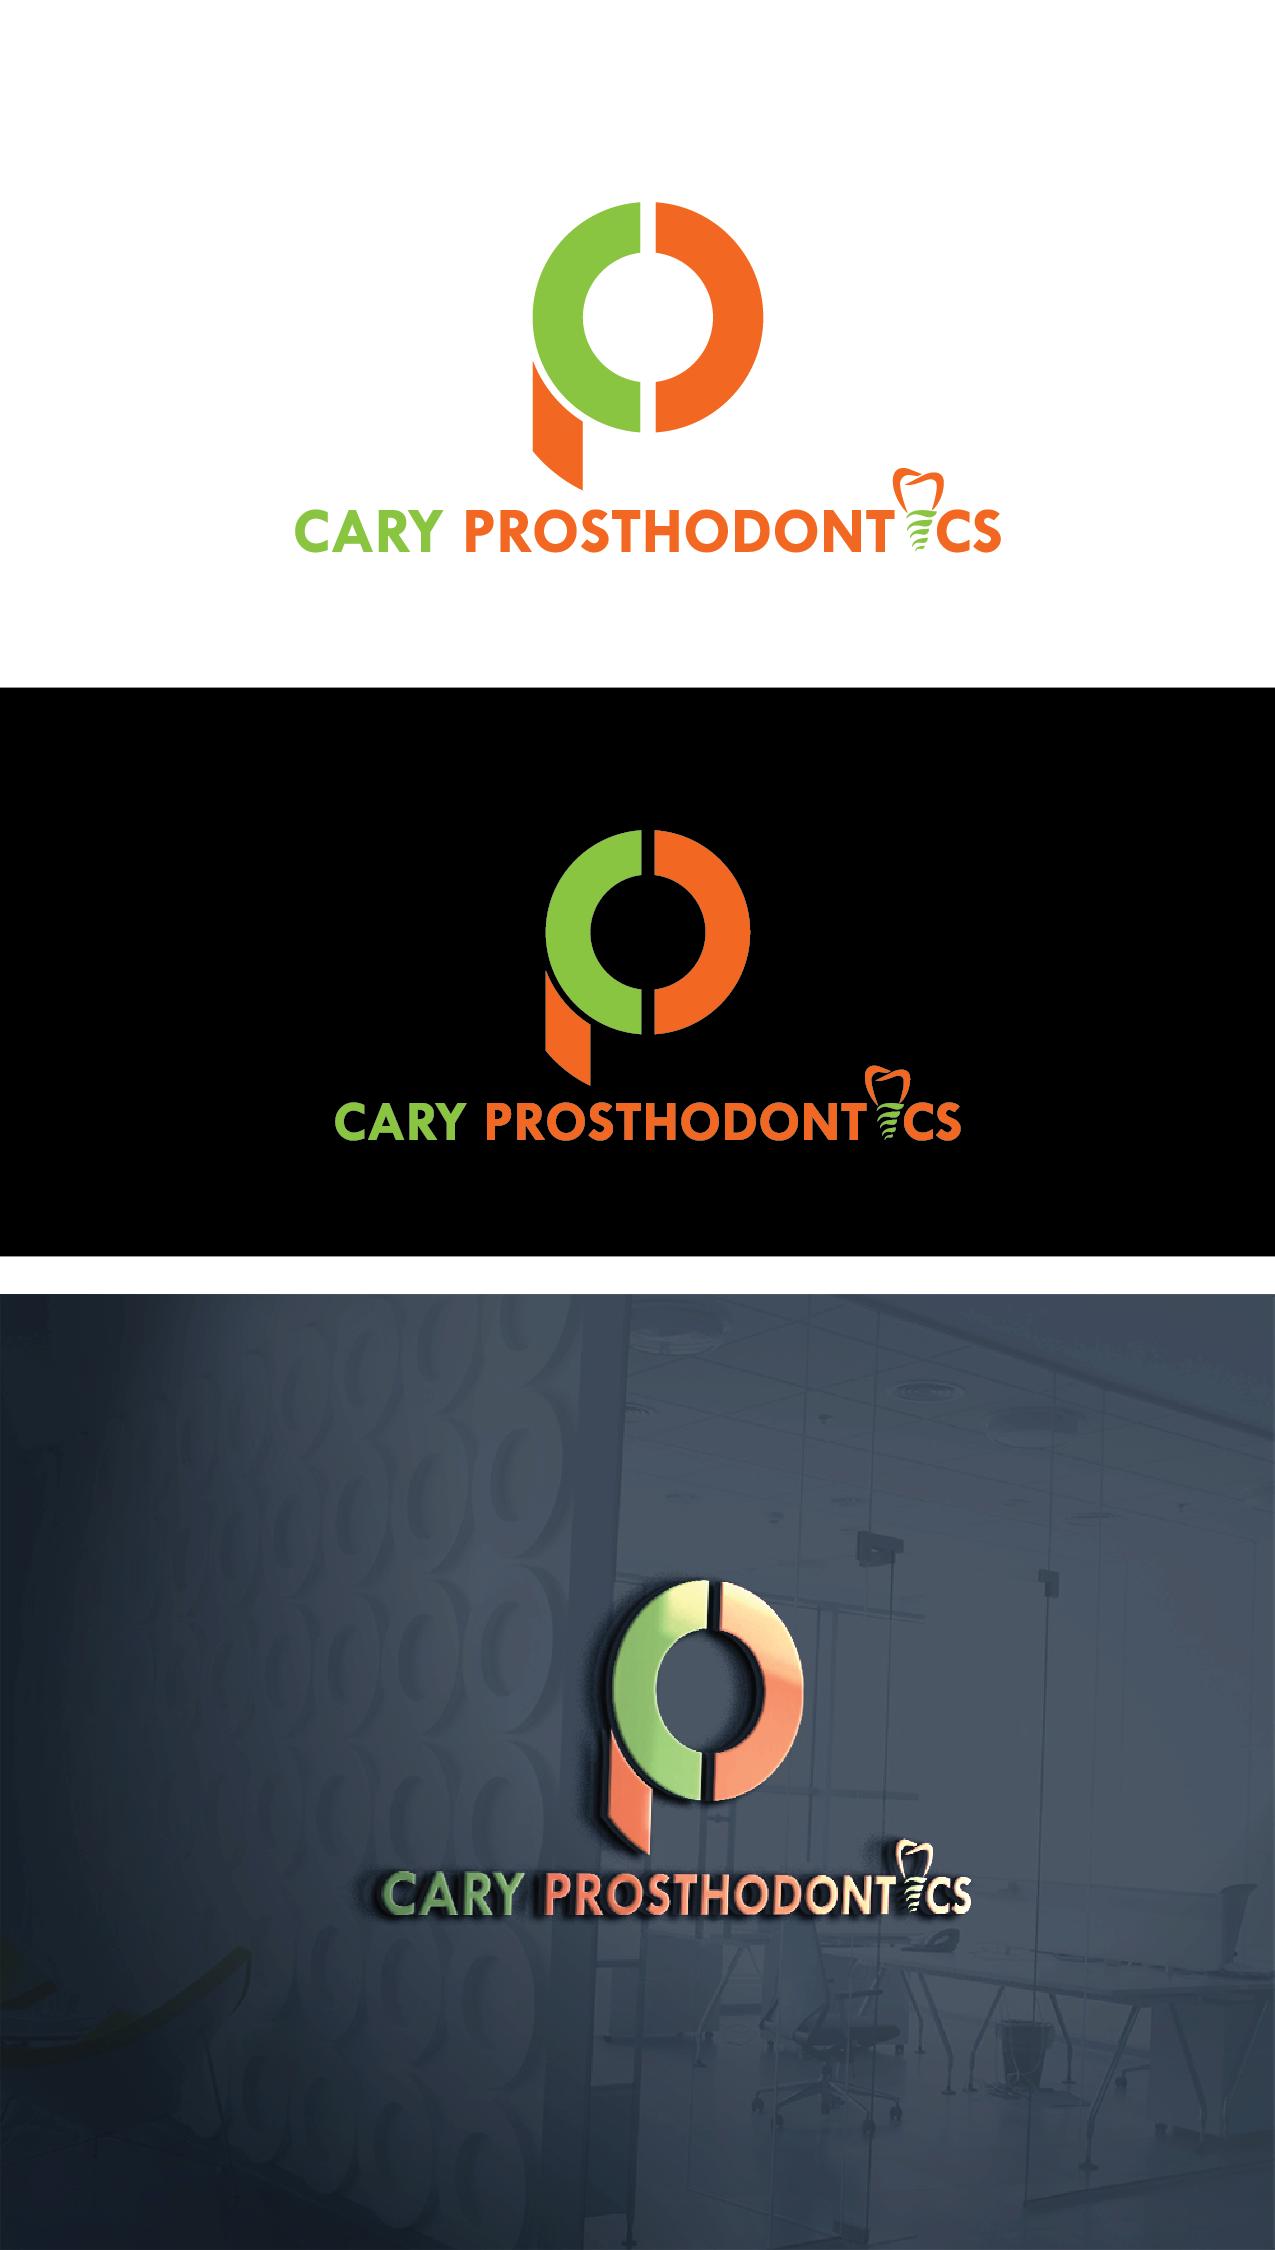 Logo Design by Private User - Entry No. 80 in the Logo Design Contest Cary Prosthodontics Logo Design.